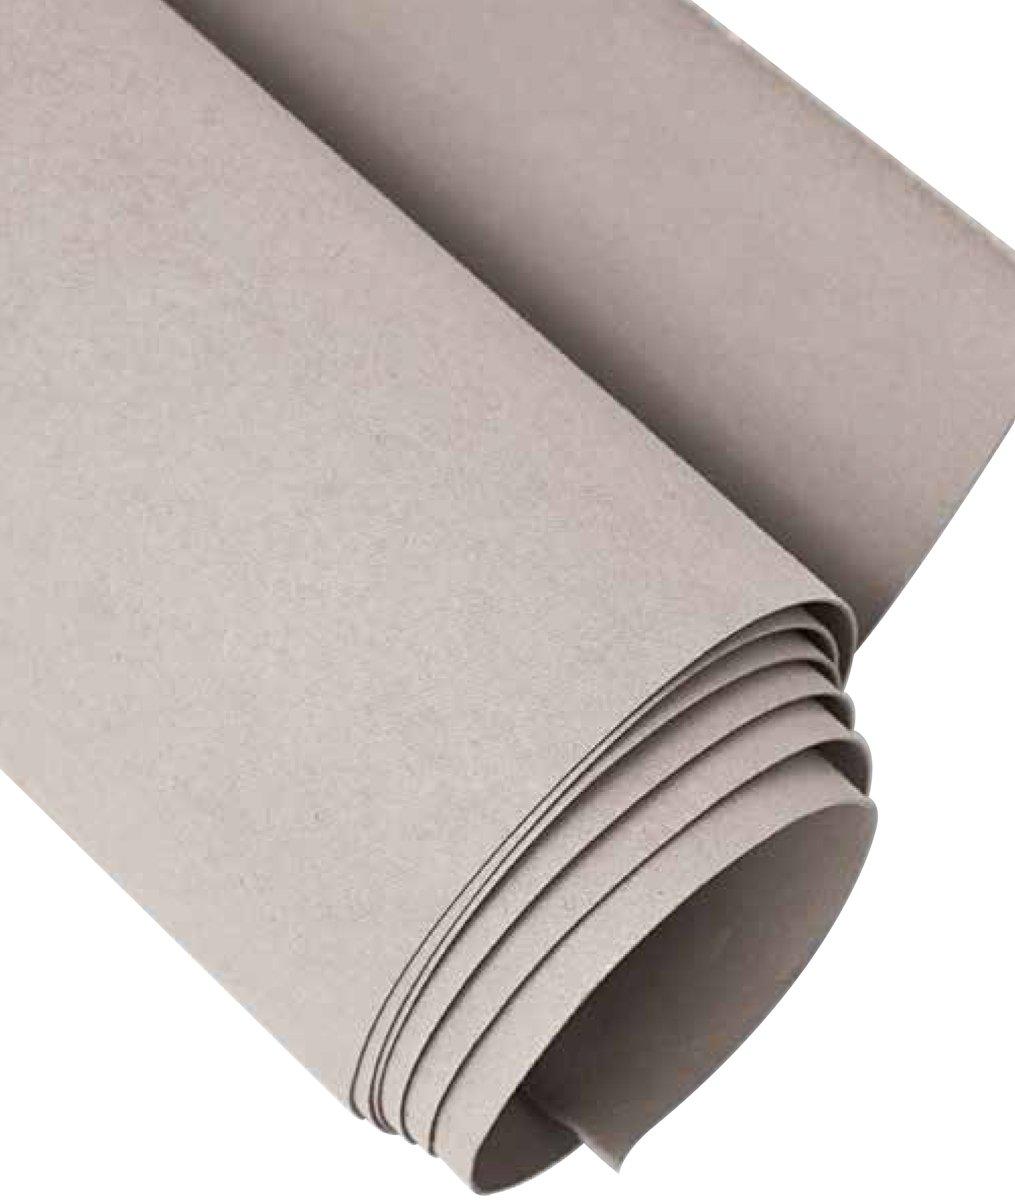 C&T Publishing Kraft-Tex Kraft Paper Fabric 18-inch x 54-inch, Stone 20290